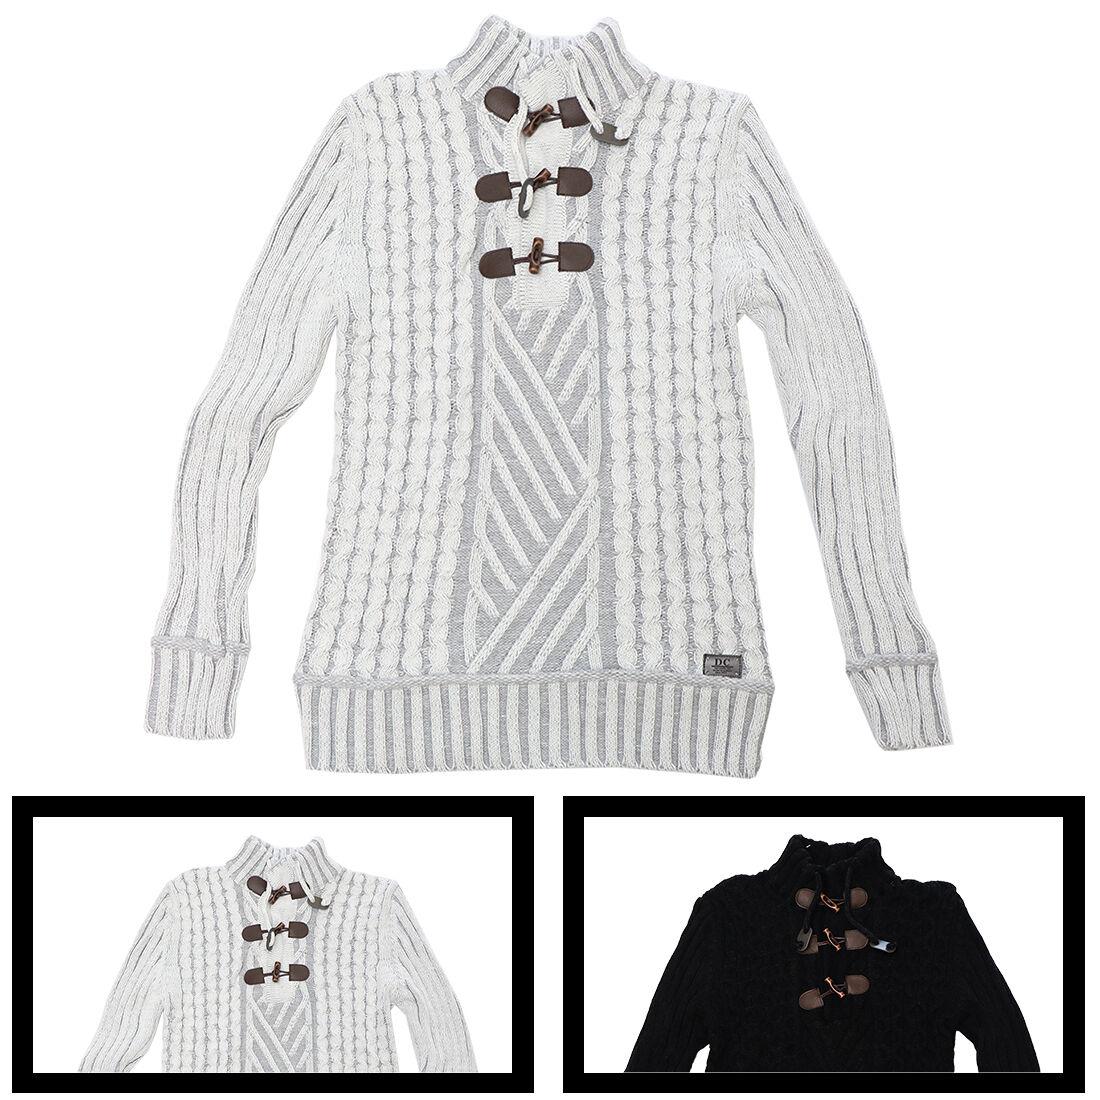 NEW DECAPRIO USA MEN LUXURY SWEATER DESIGNER CLOTHS CCT0516K539